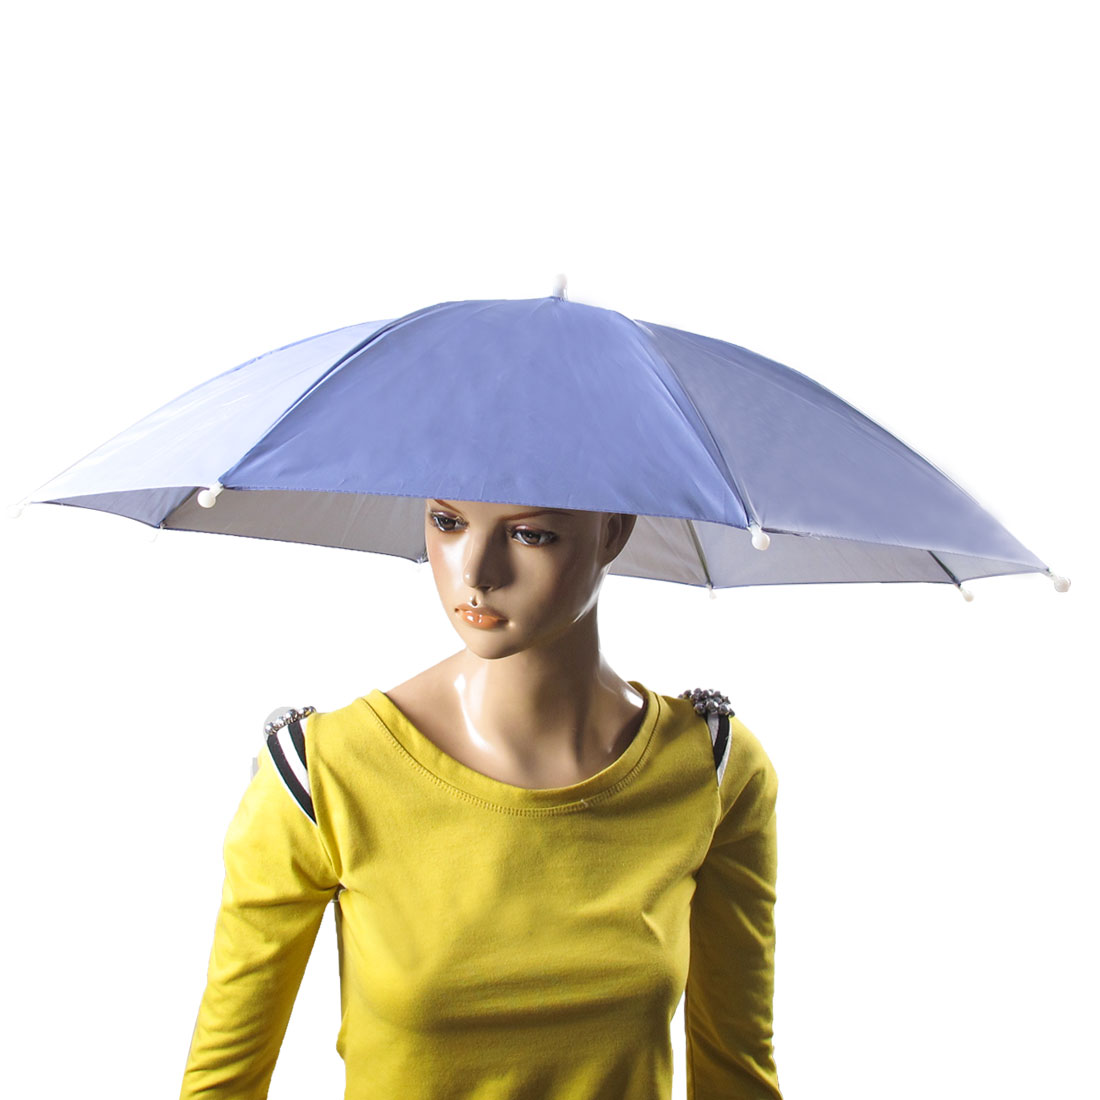 Fishing Sports Elastic Head Band Headwear Umbrella Hat Light Blue